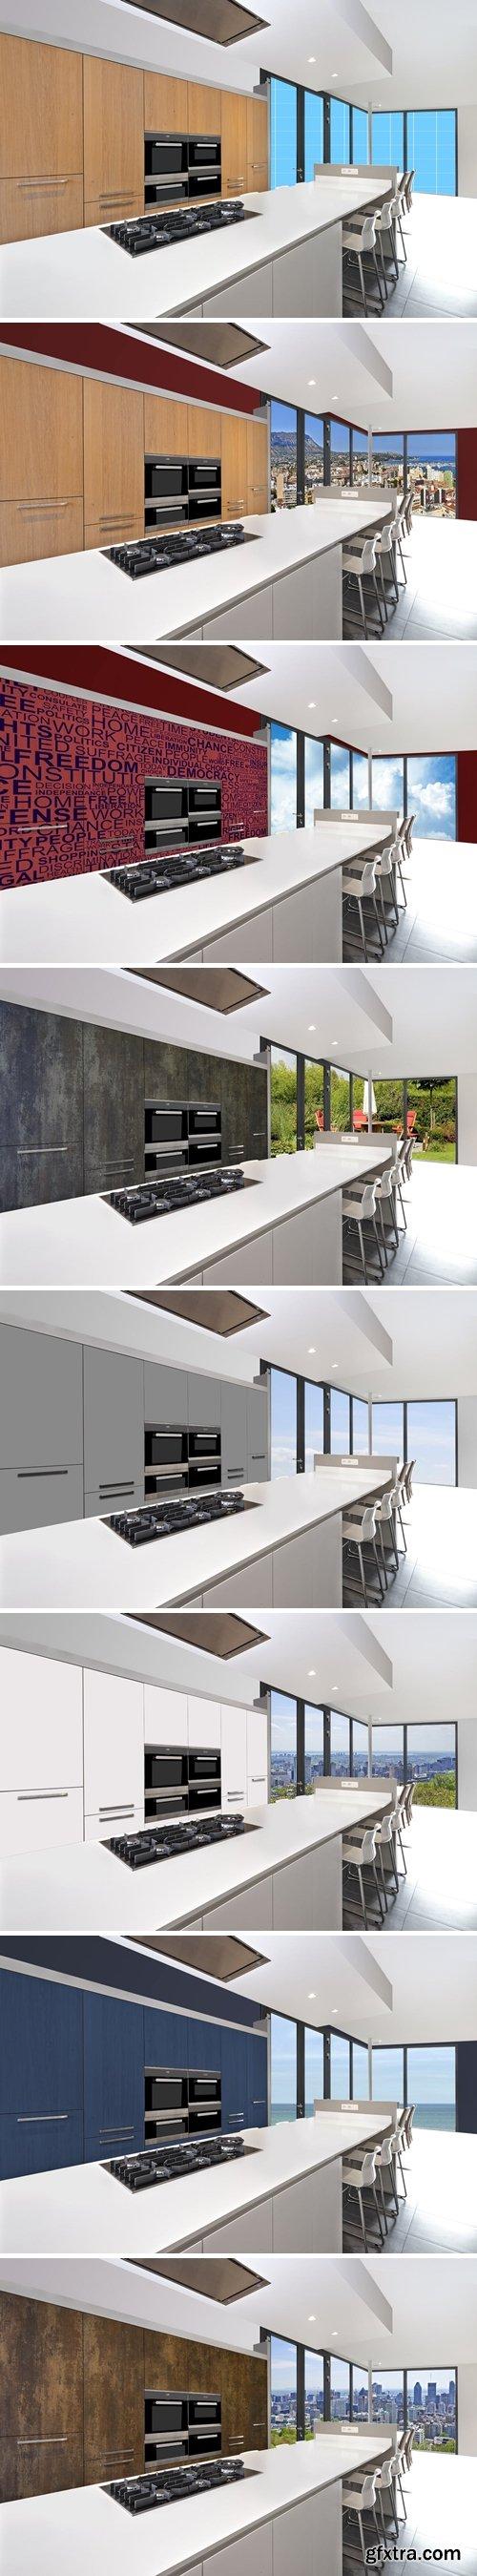 Modern-Kitchen-01_mockup